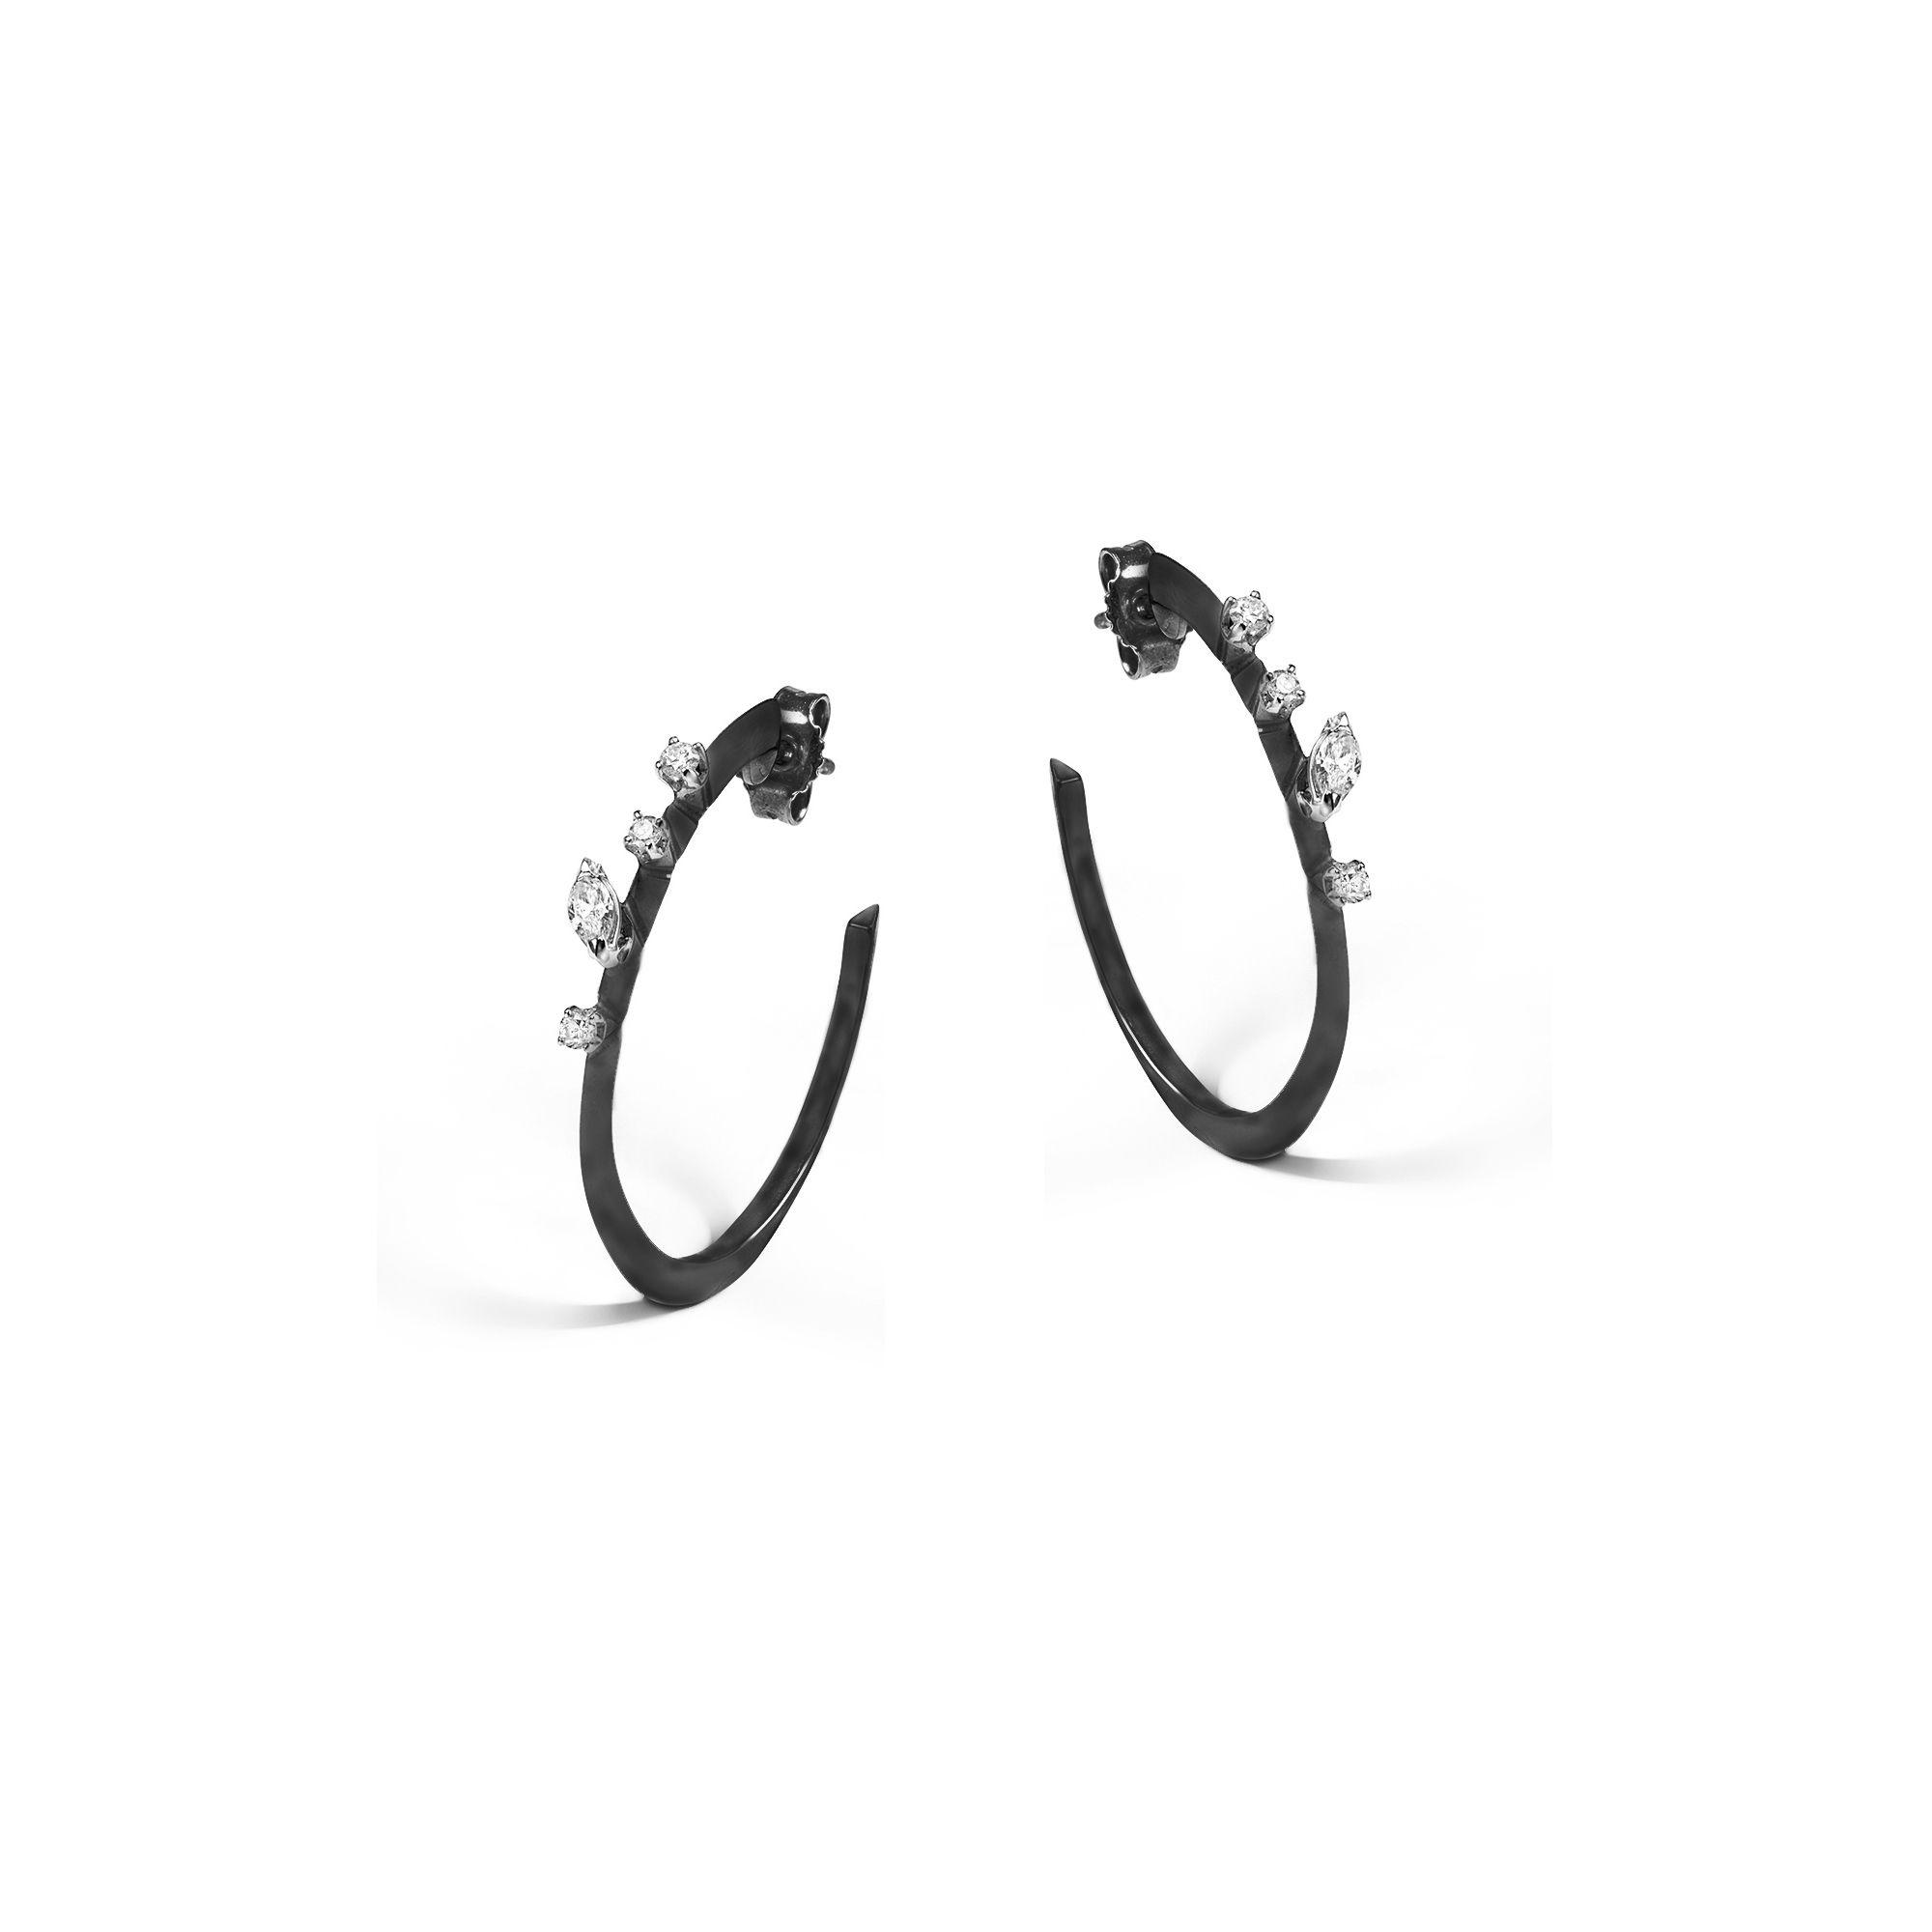 M 'Balance' hoop earrings Black gold earrings with diamonds